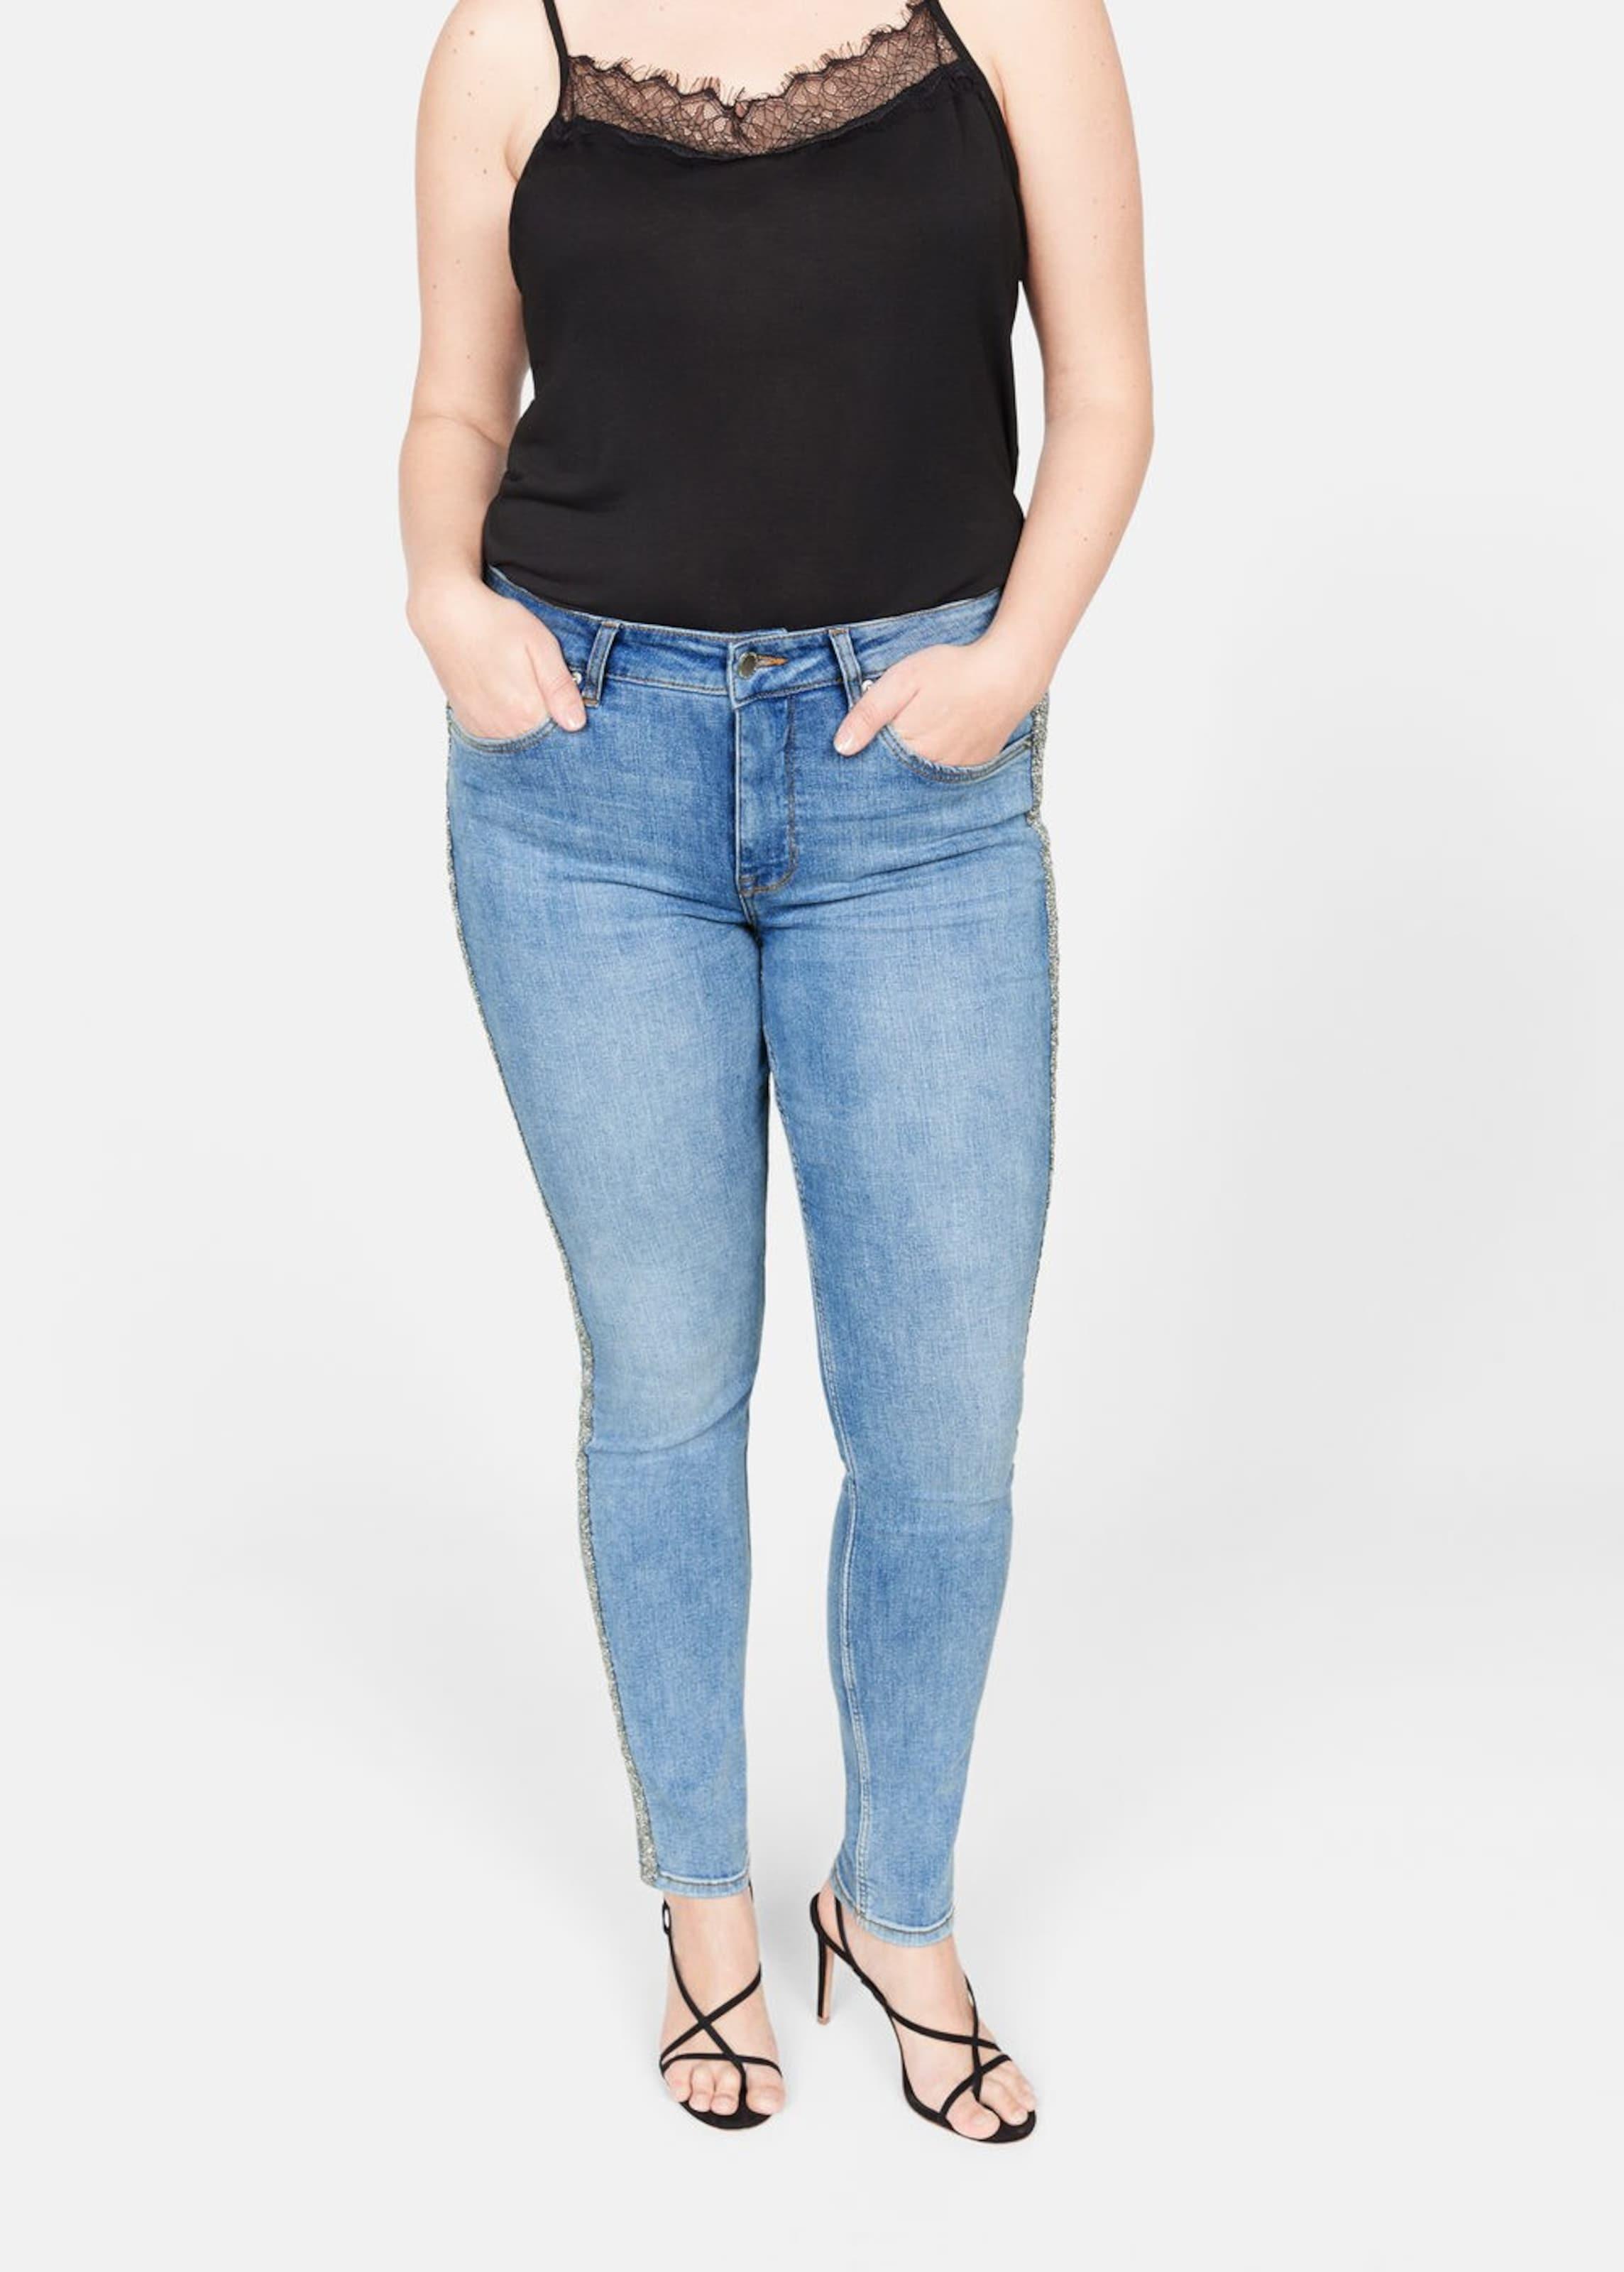 'silver' In Violeta Mango Denim Blue By Jeans L4j5AR